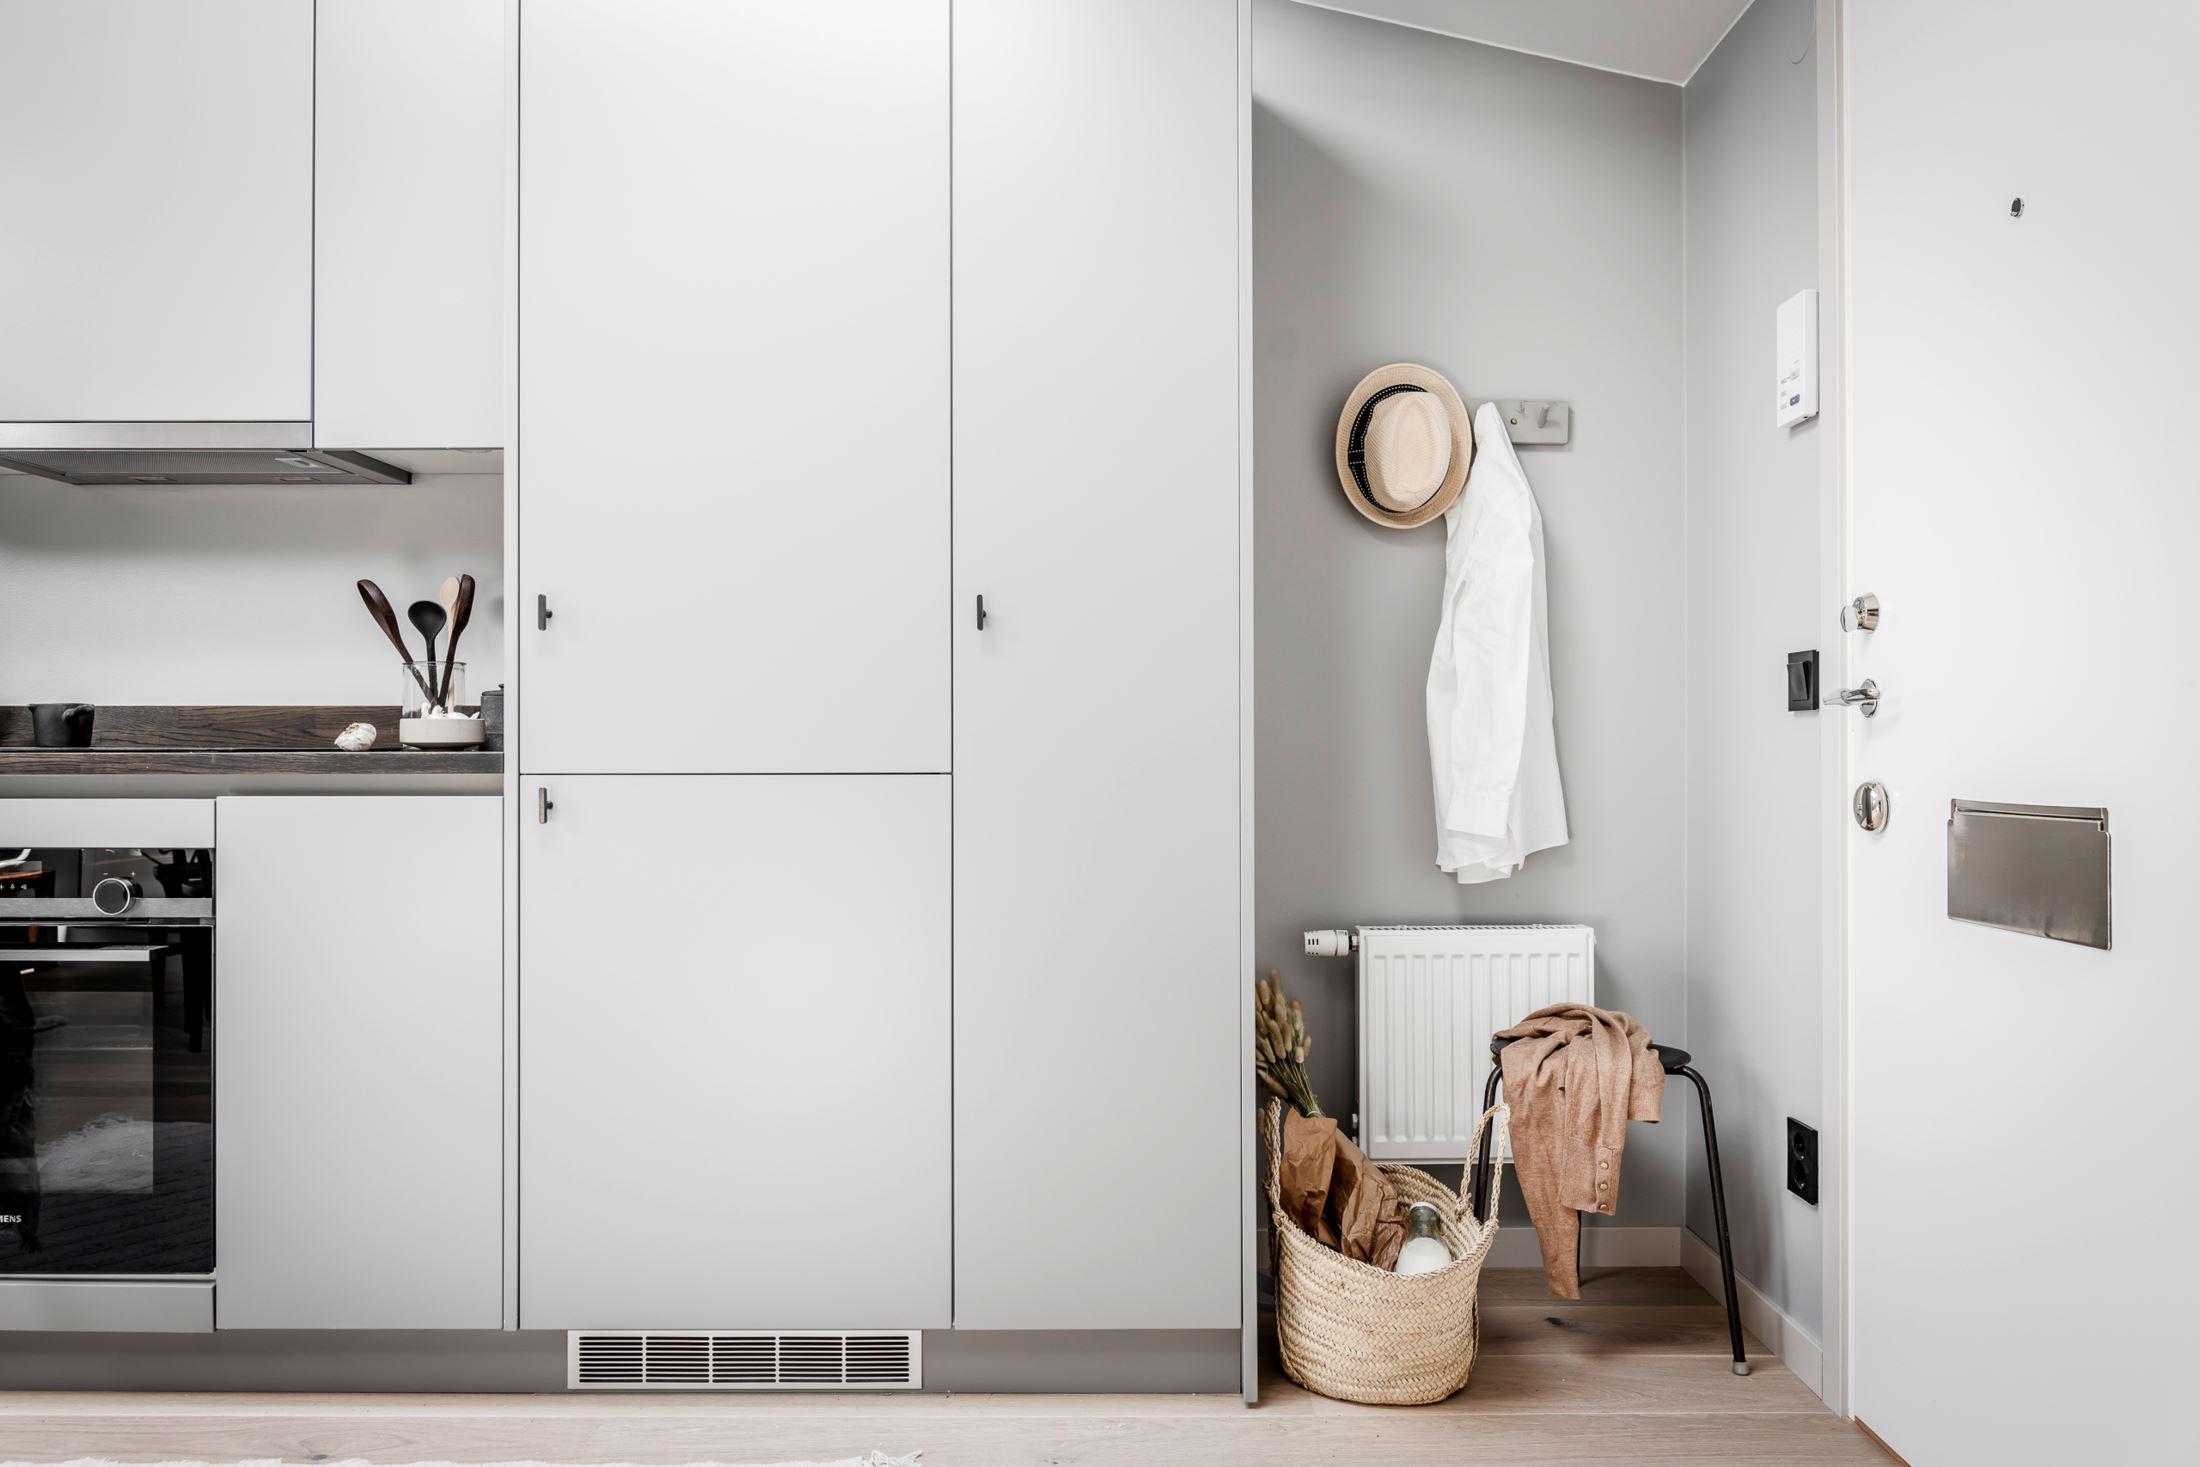 Plan deschis și decor nordic într o garsonieră la mansardă 35 m² 5